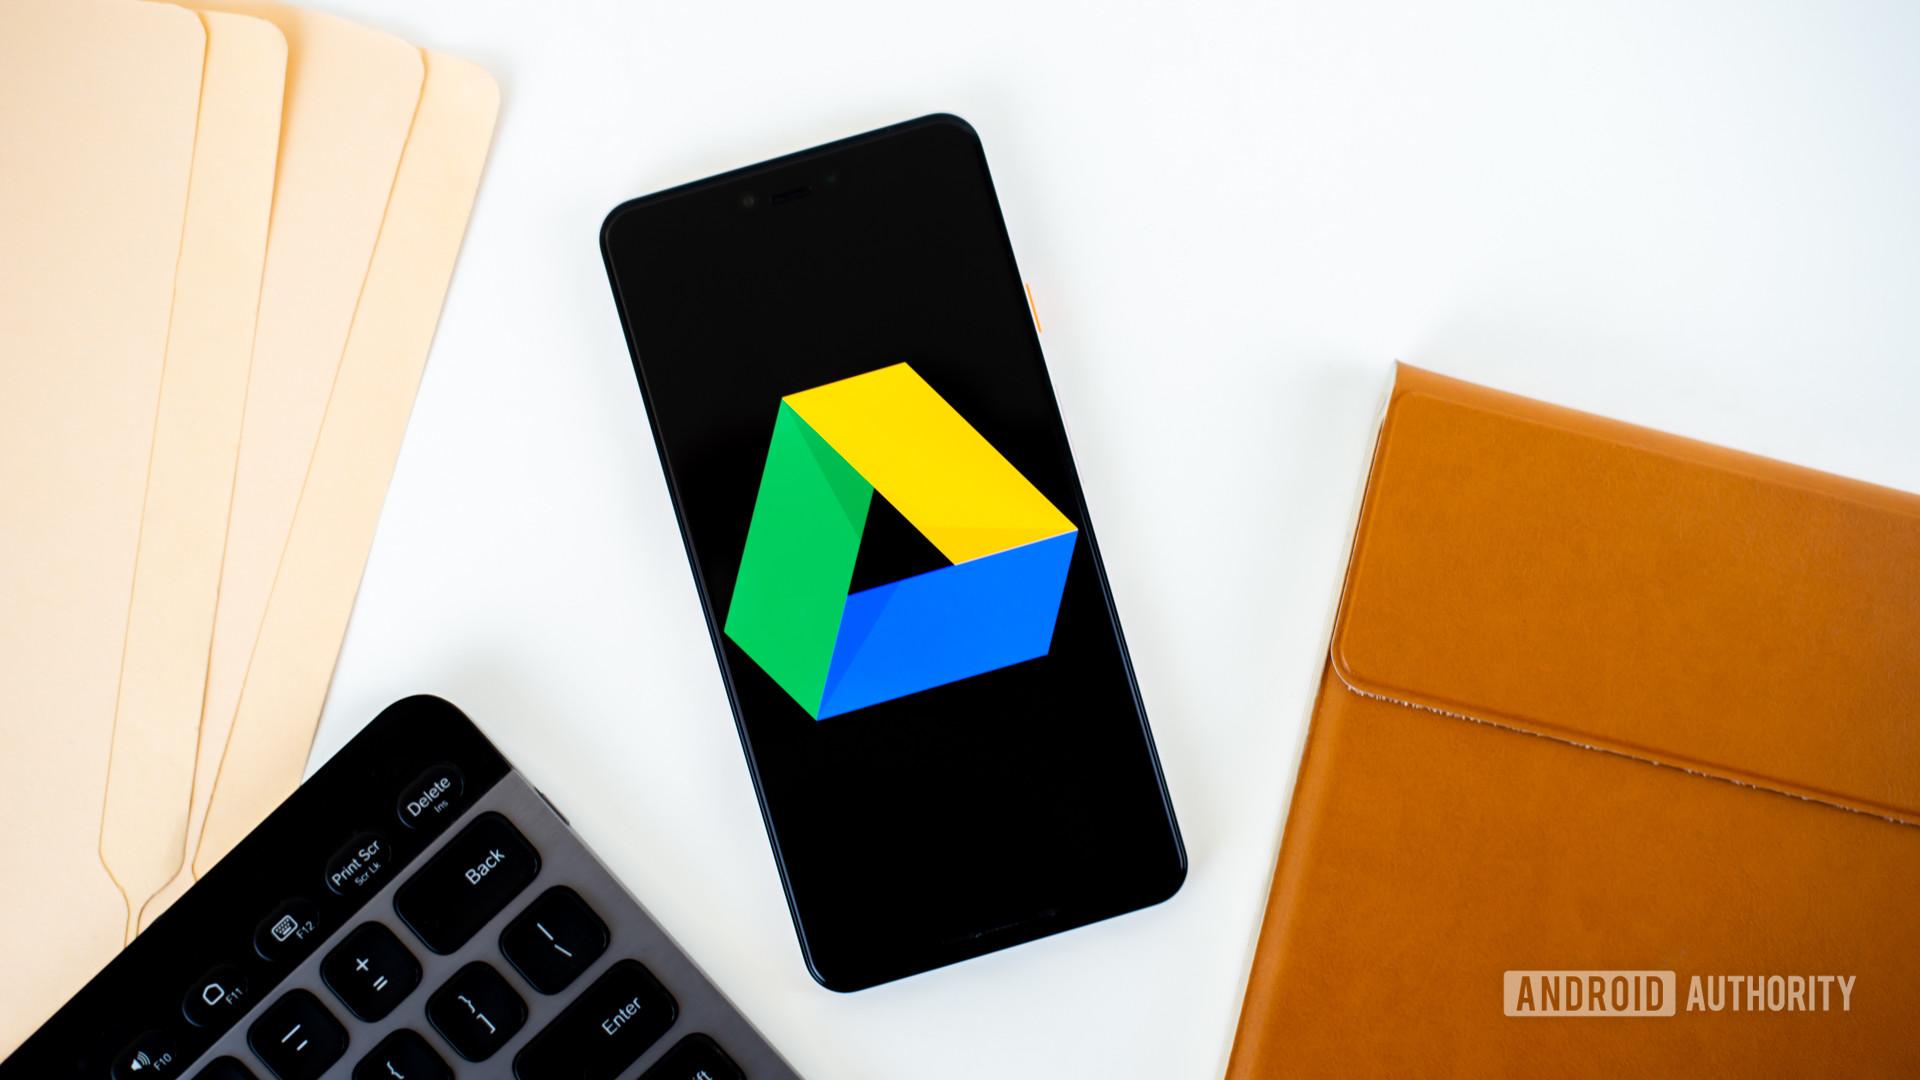 Google Drive logo on smartphone stock photo 3